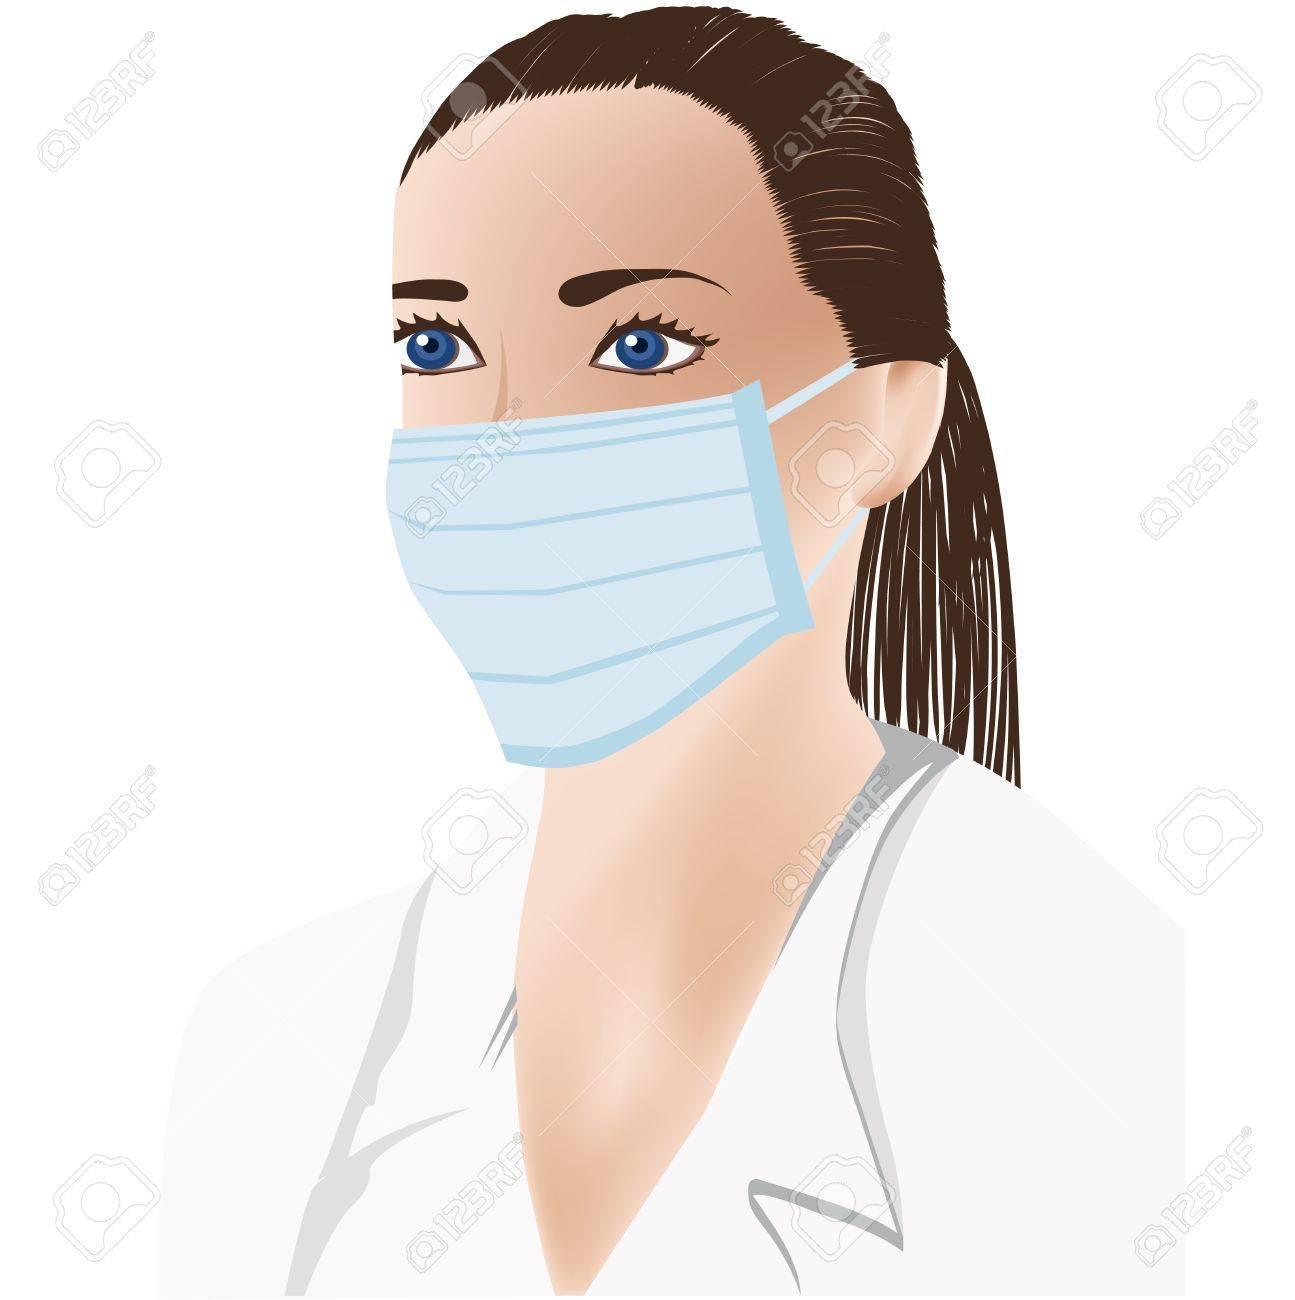 Clipart face mask banner Medical face mask clipart 7 » Clipart Portal banner